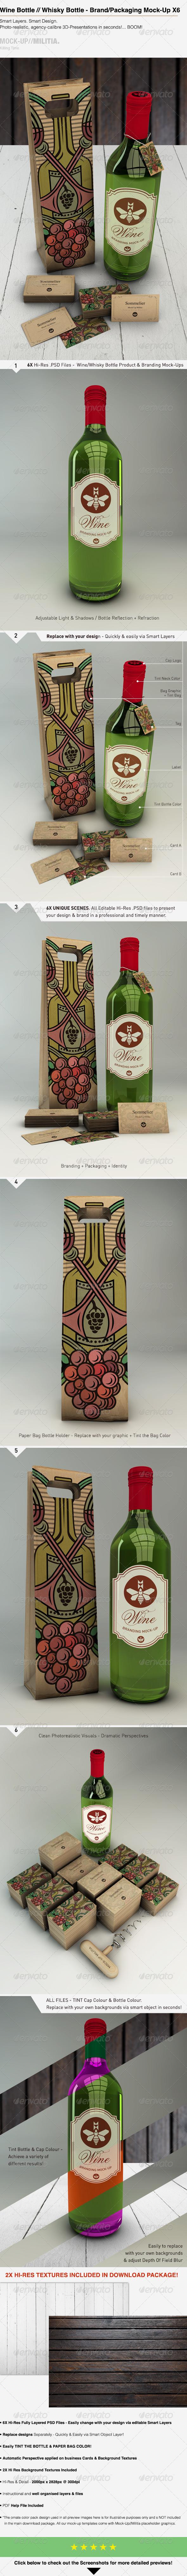 GraphicRiver Wine Whisky Bottle Branding Packaging Mock-Up 7802223